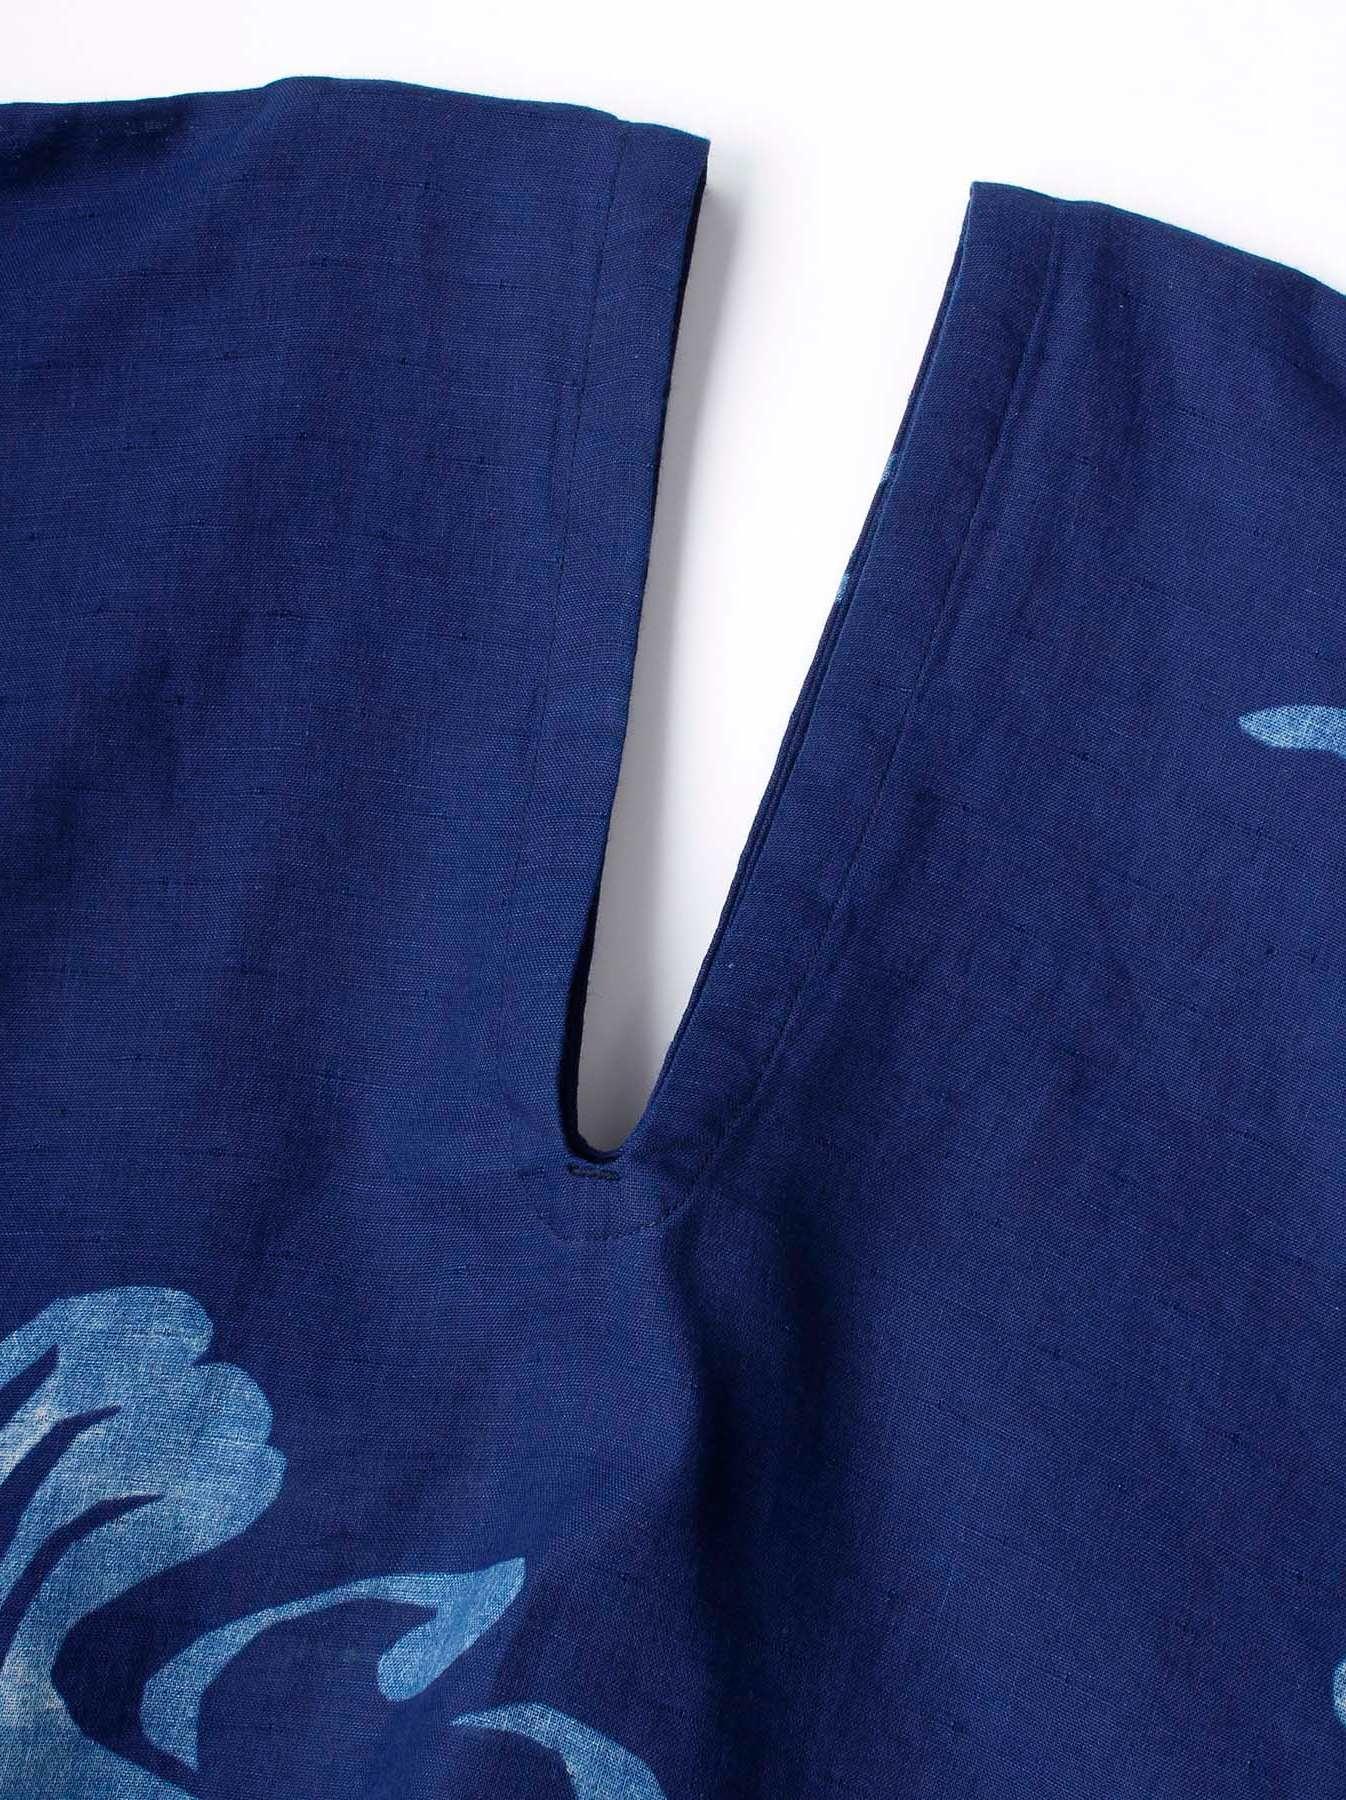 WH Indigo W-cloth Umiiloha Blouse-5